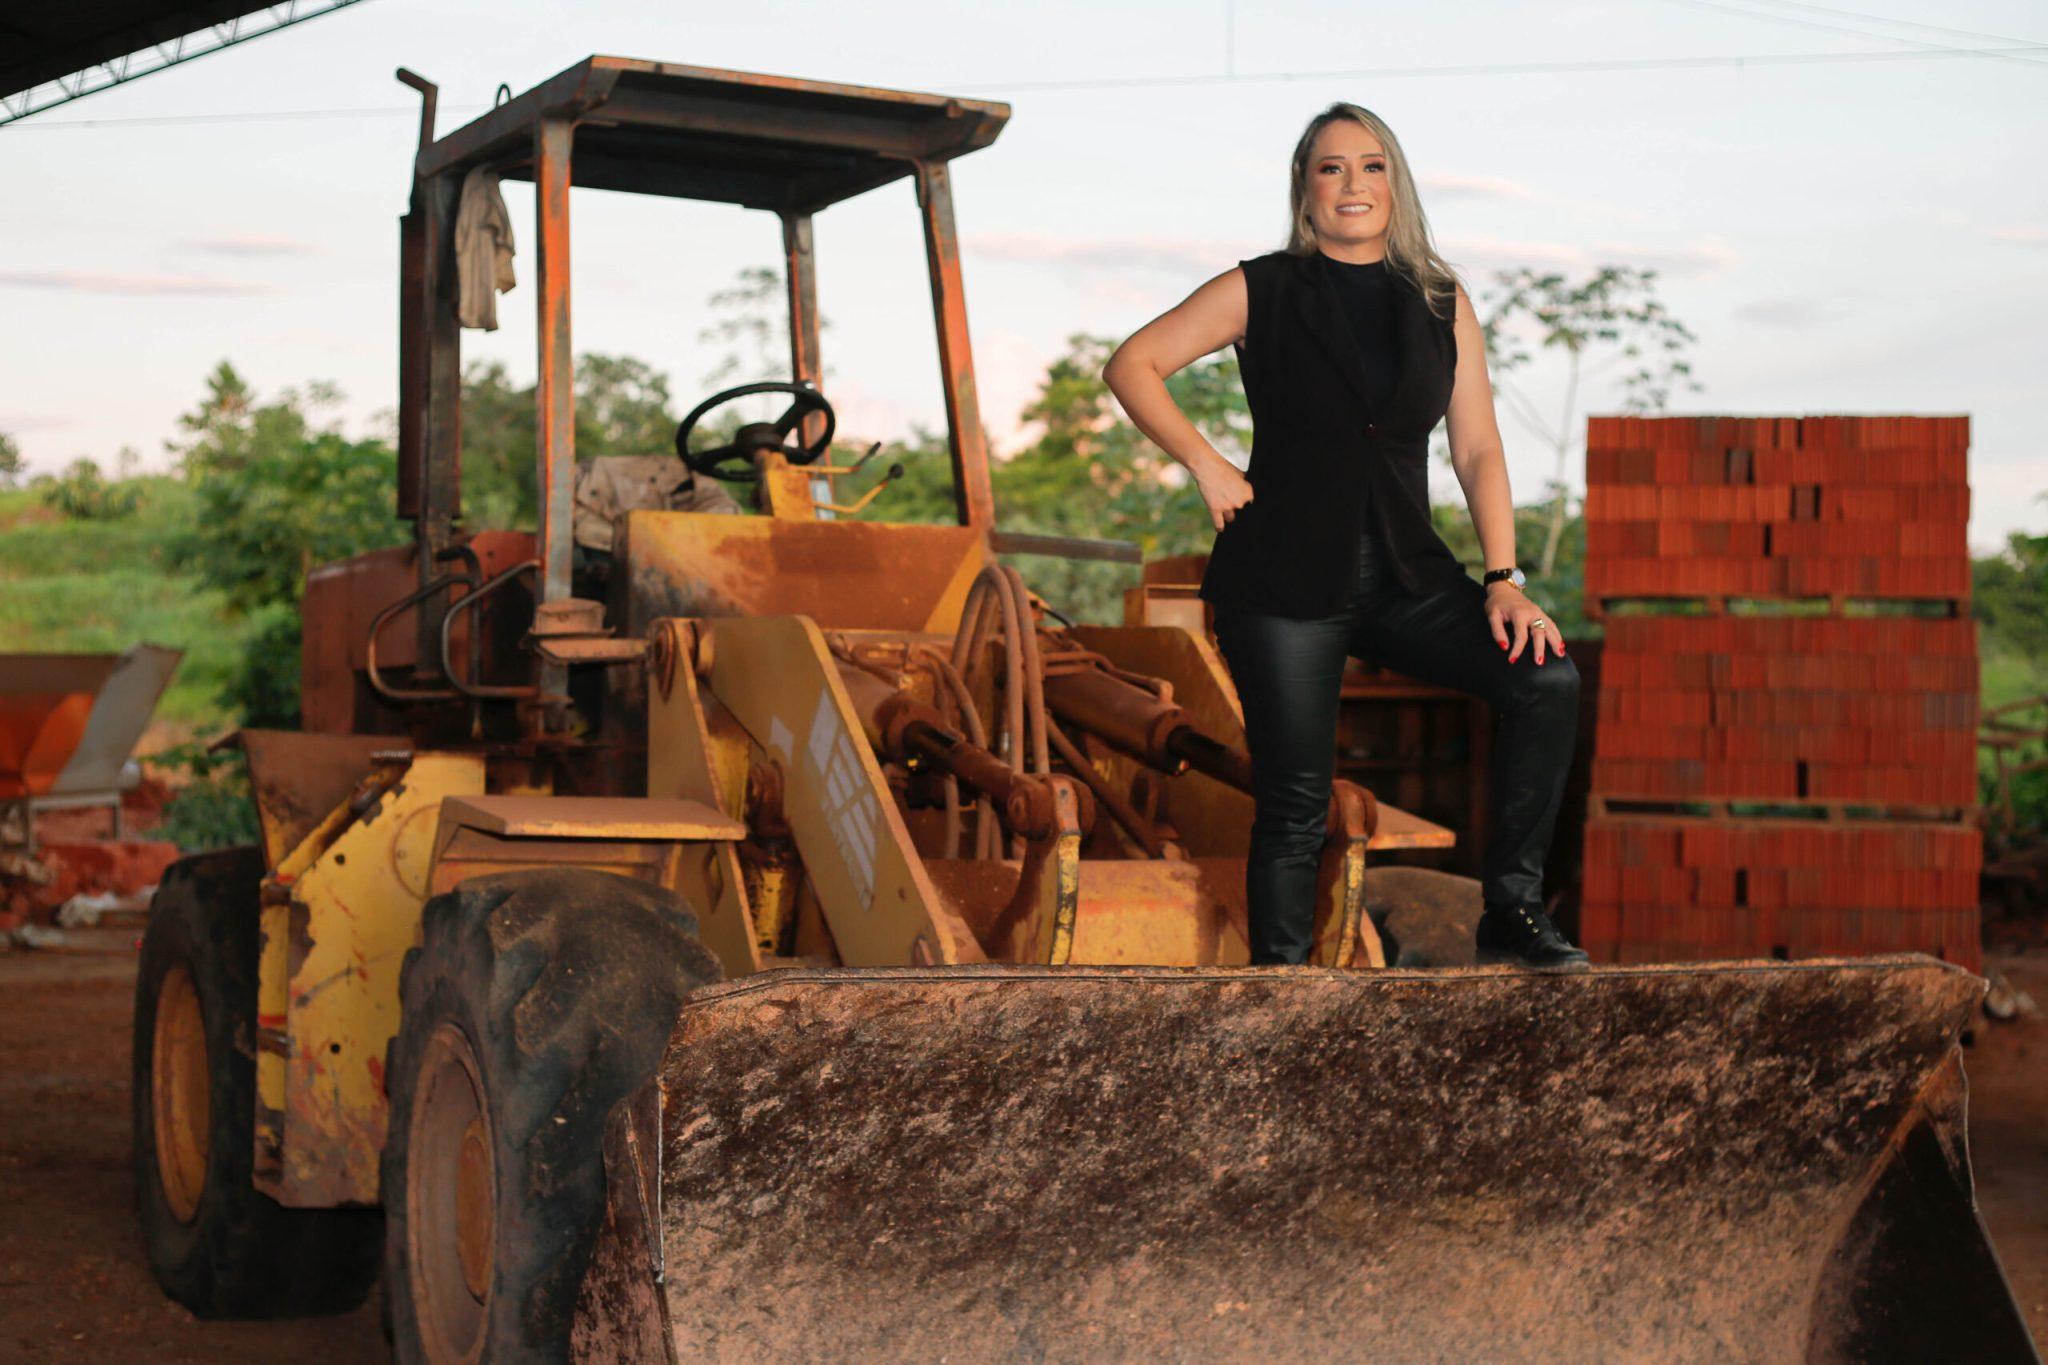 mulher assume negócio tijolo tijolos pai moderniza empresa